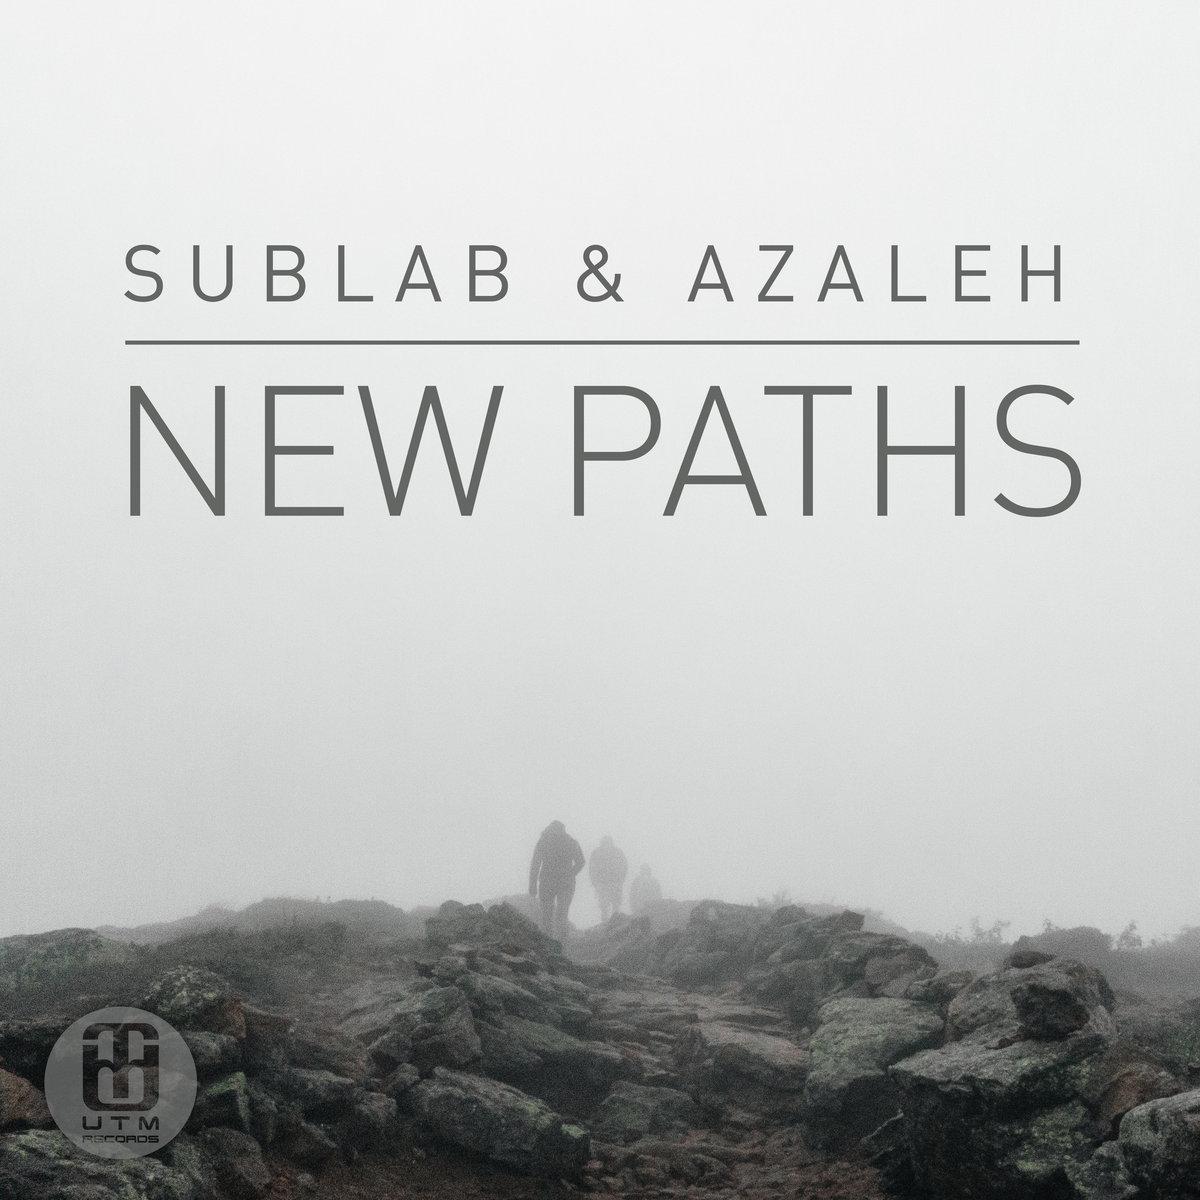 13. Sublab Azaleh - New Paths